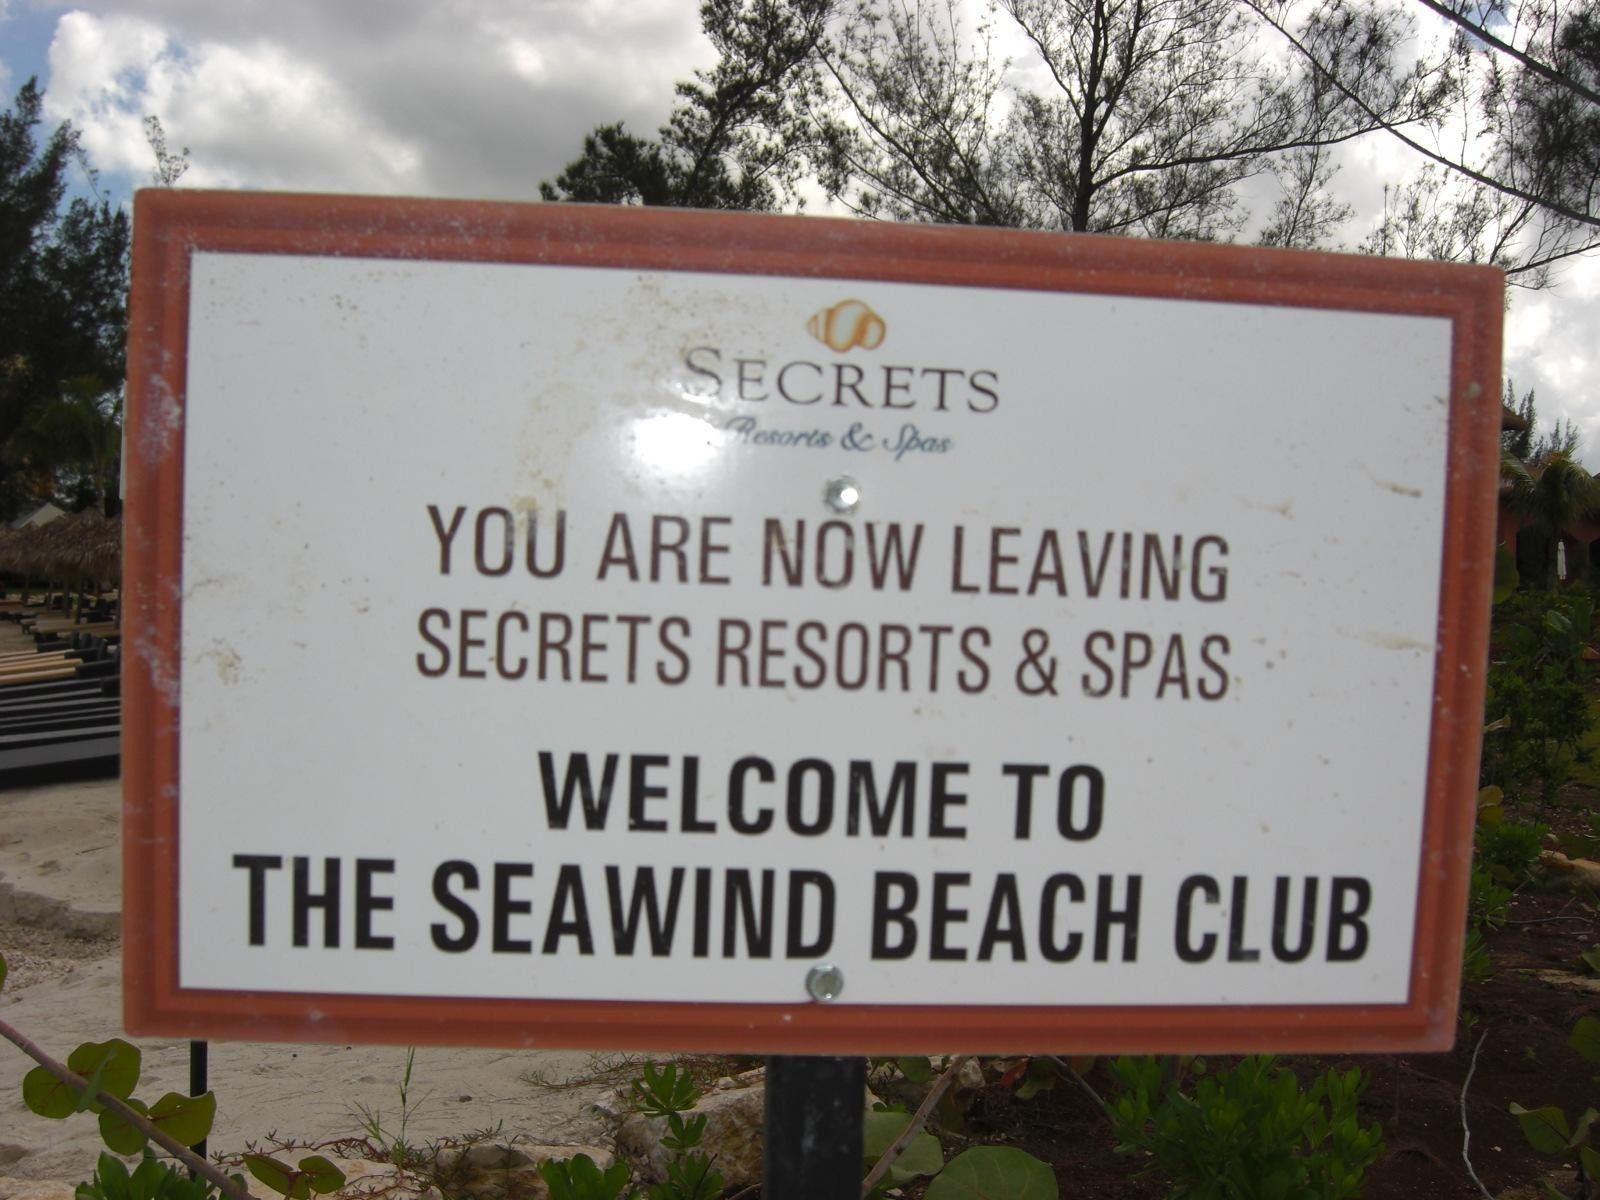 Seawinds Beach Club By Flipflopman